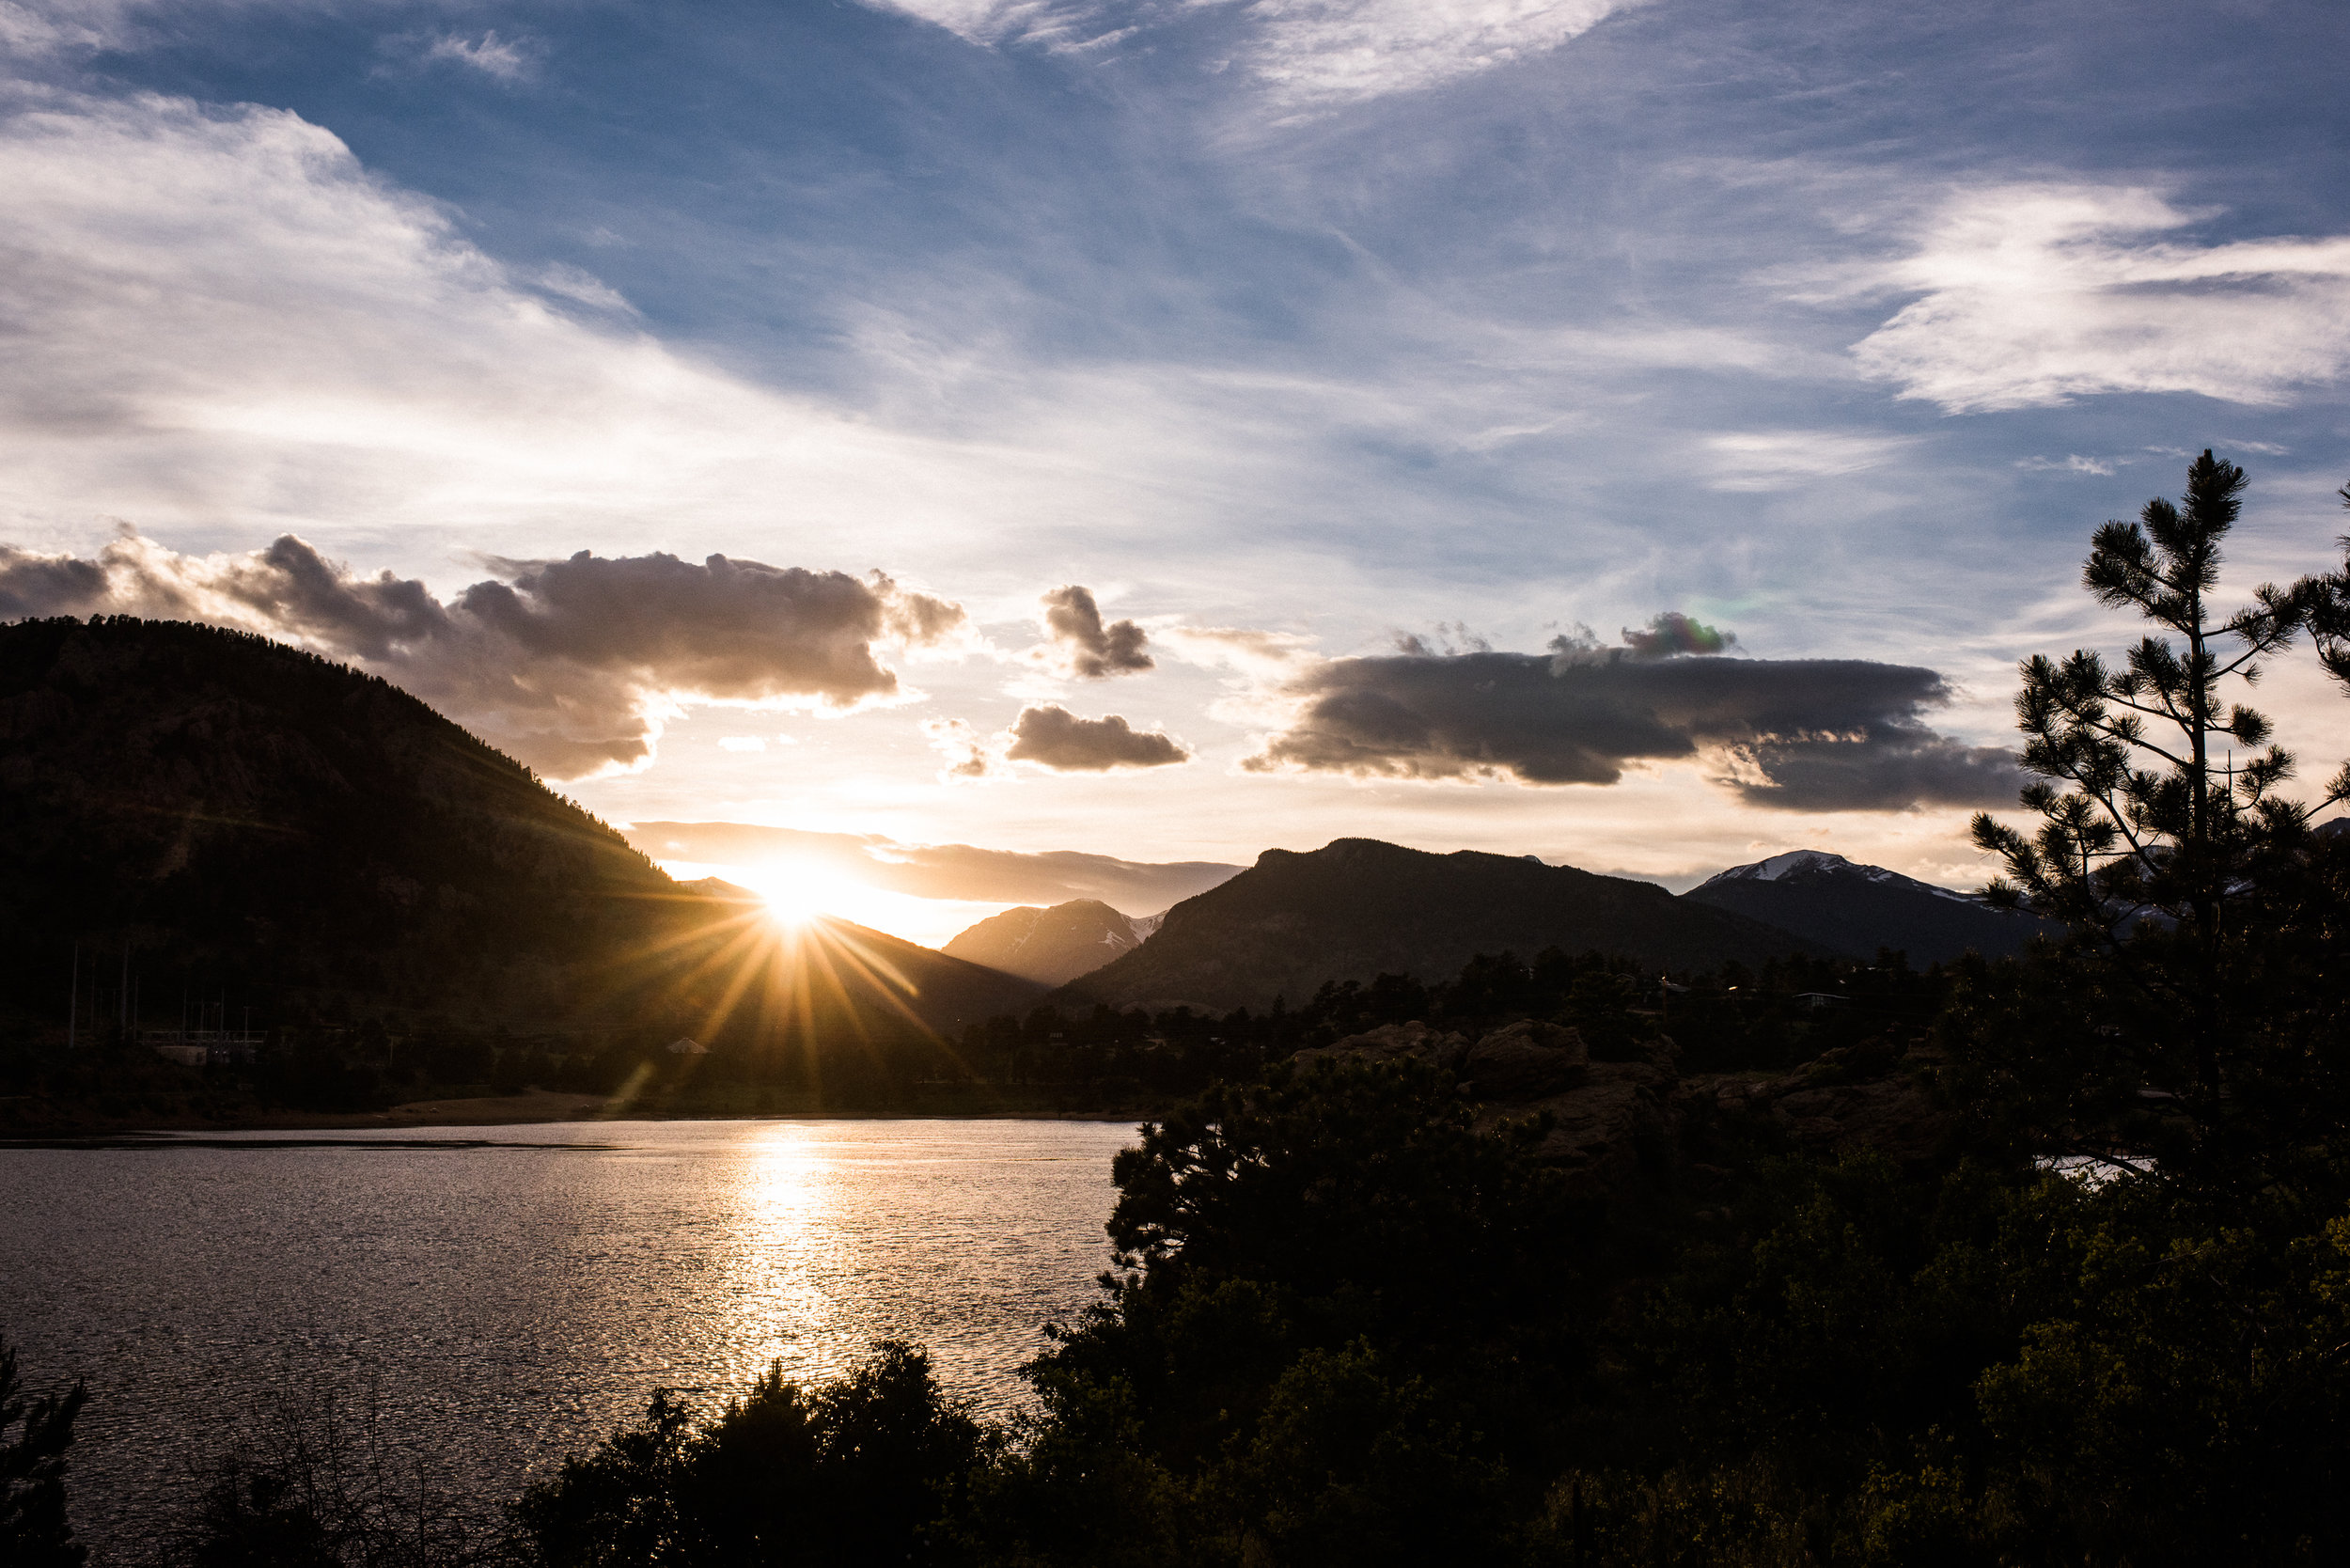 Colorado_Estes_Park_RockClimbing_TaraShupe_014.jpg